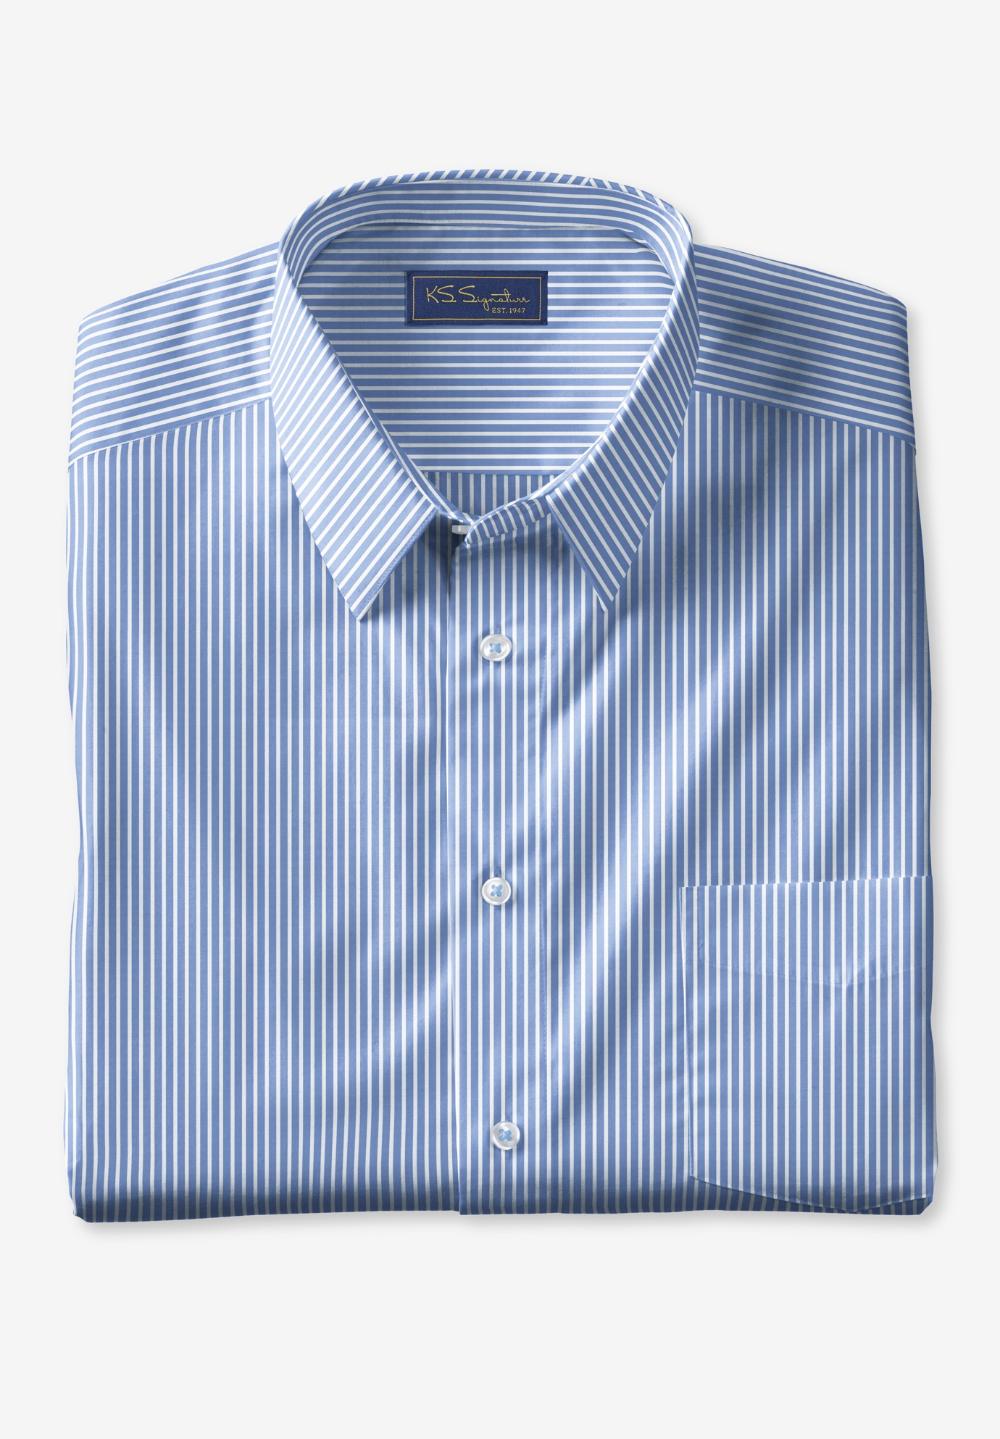 Ks Signature No Hassle Long Sleeve Dress Shirt King Size Shirts Long Sleeve Shirt Dress Shirt Dress [ 1439 x 1000 Pixel ]